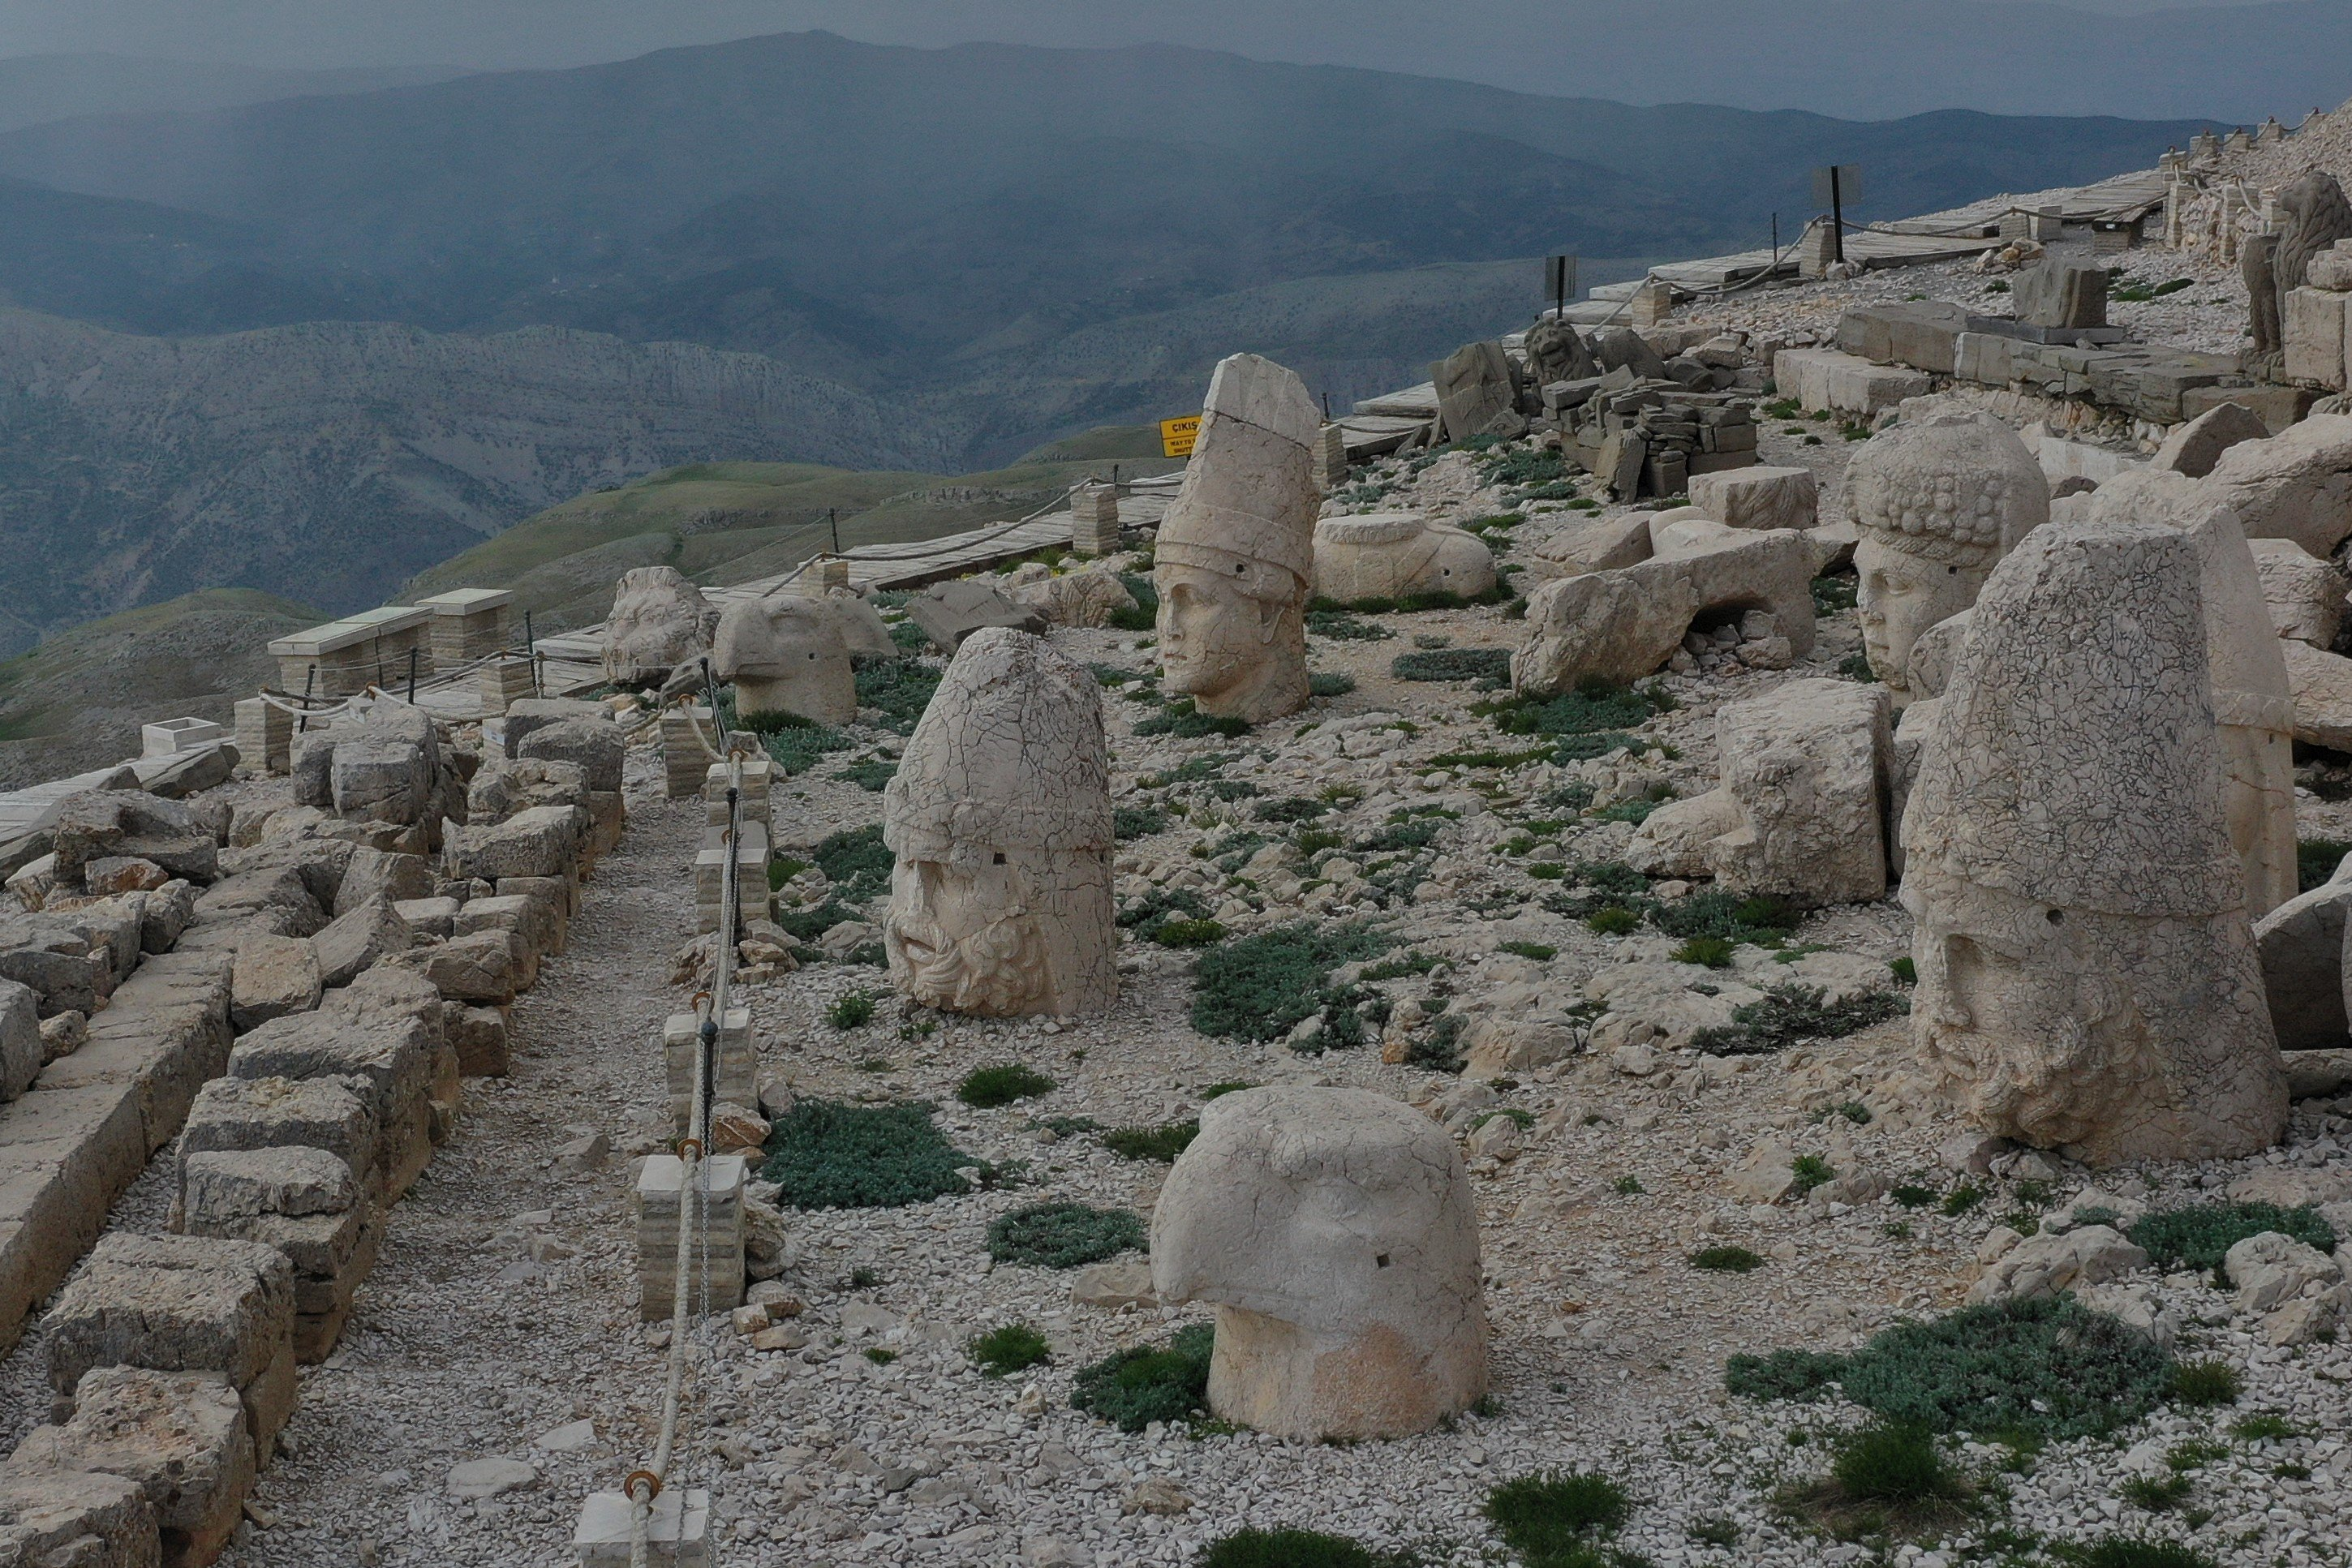 Mount Nemrut features giant structures belonging to the Kingdom of Commagene. (AA PHOTO)